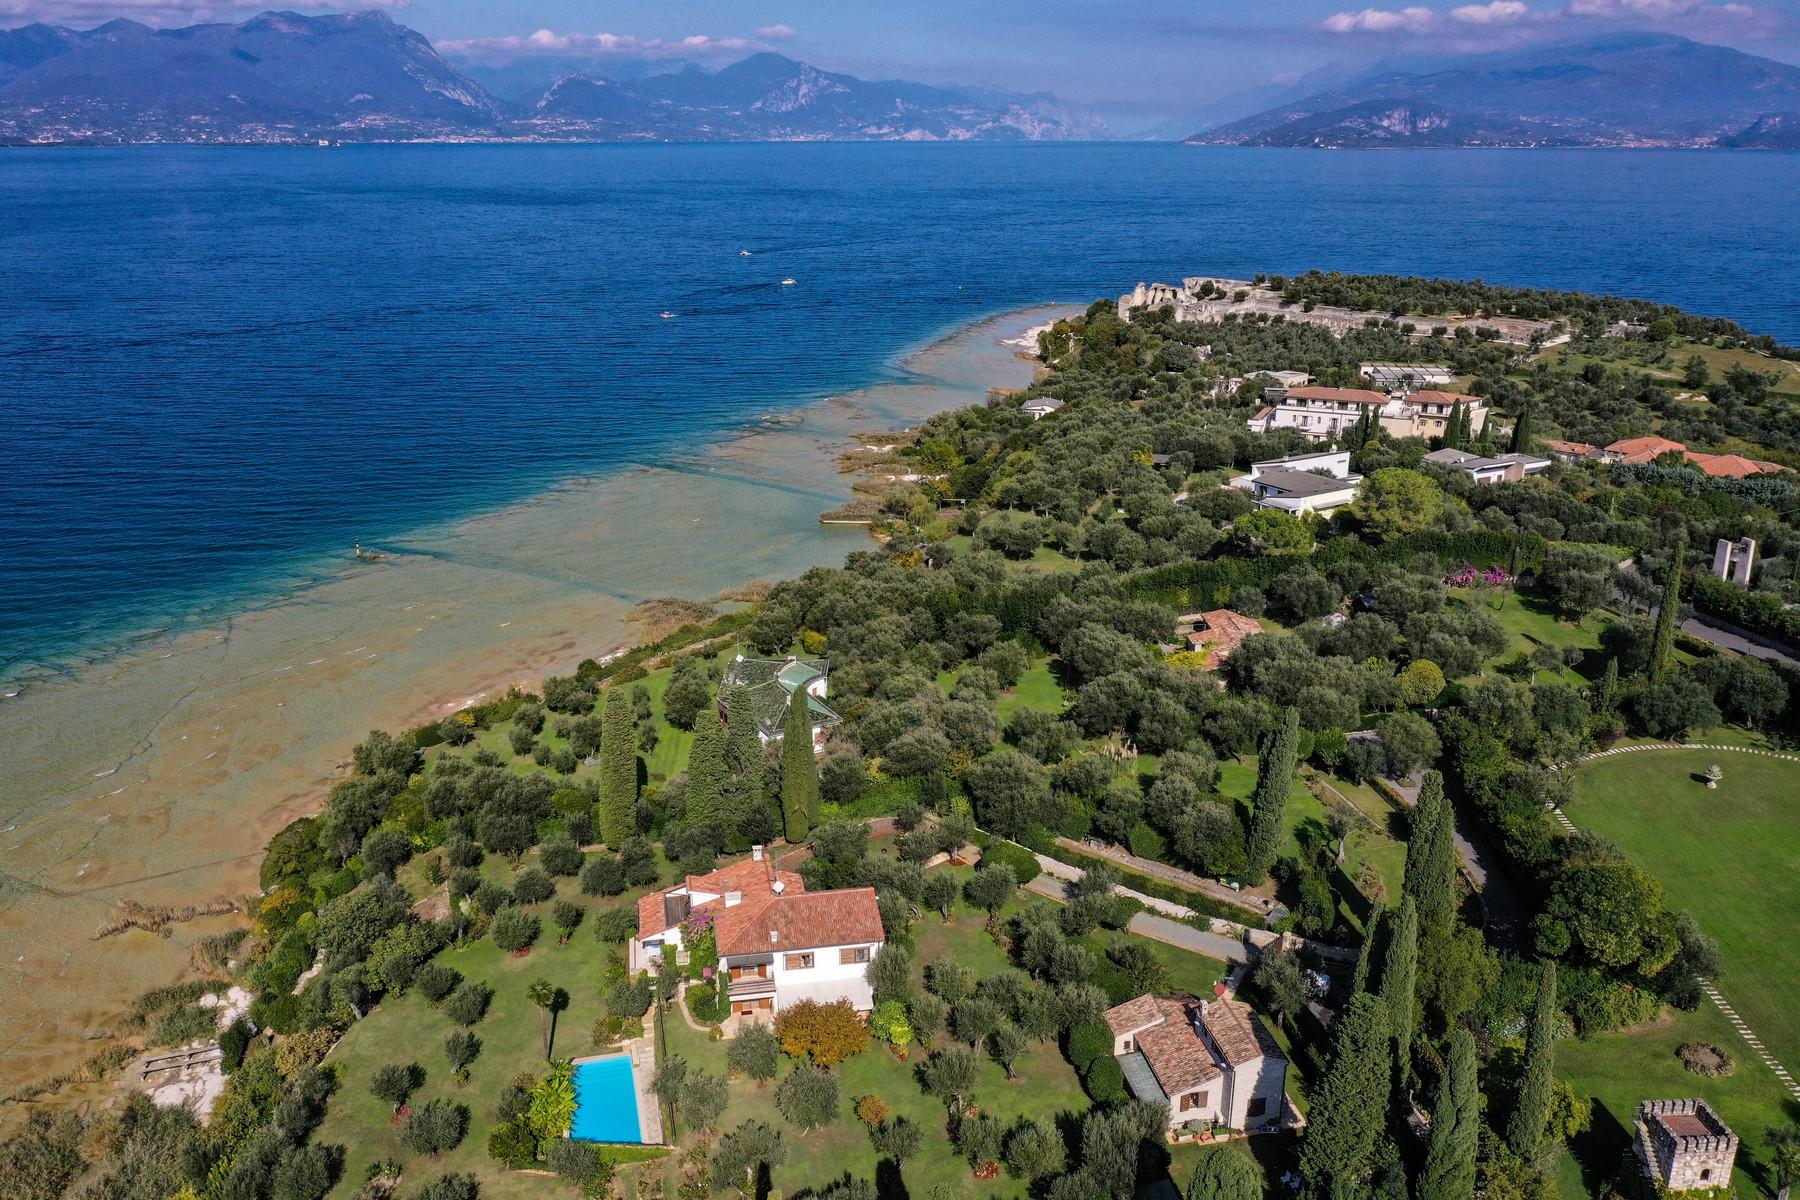 Villa in Vendita a Sirmione: 5 locali, 500 mq - Foto 24